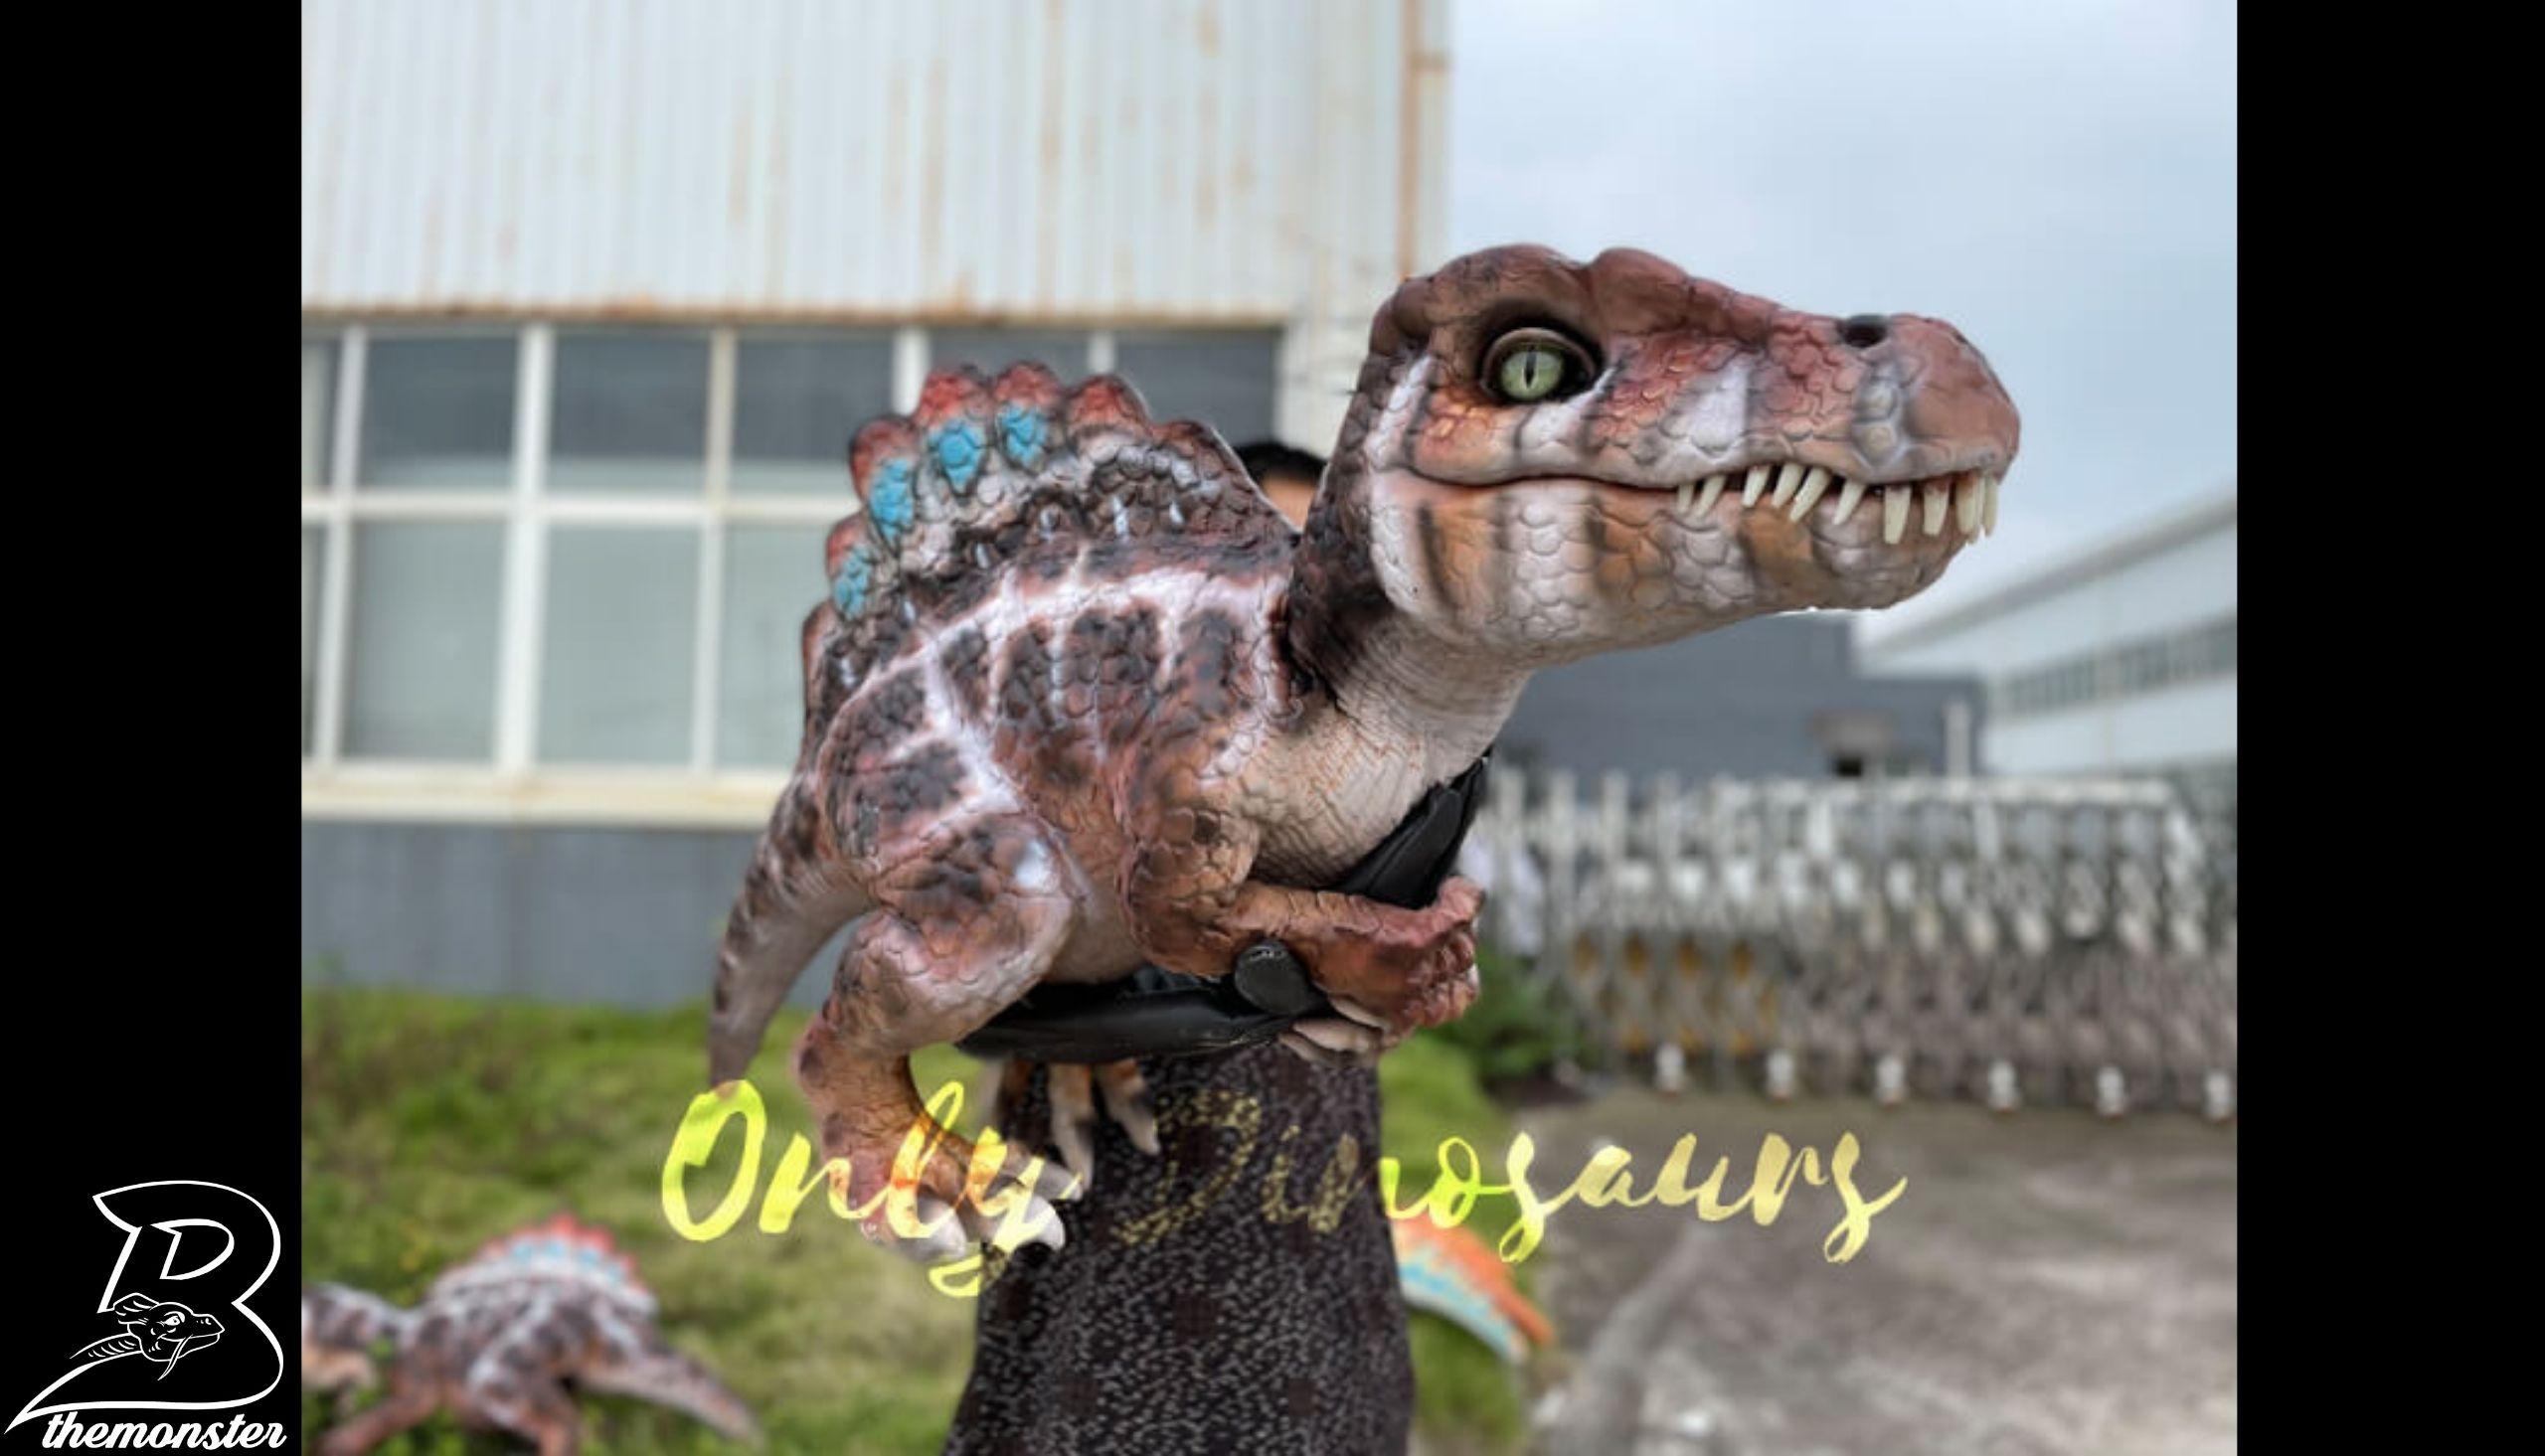 Adorable Baby Spinosaurus False Arm Puppet in vendita sul Bthemonster.com